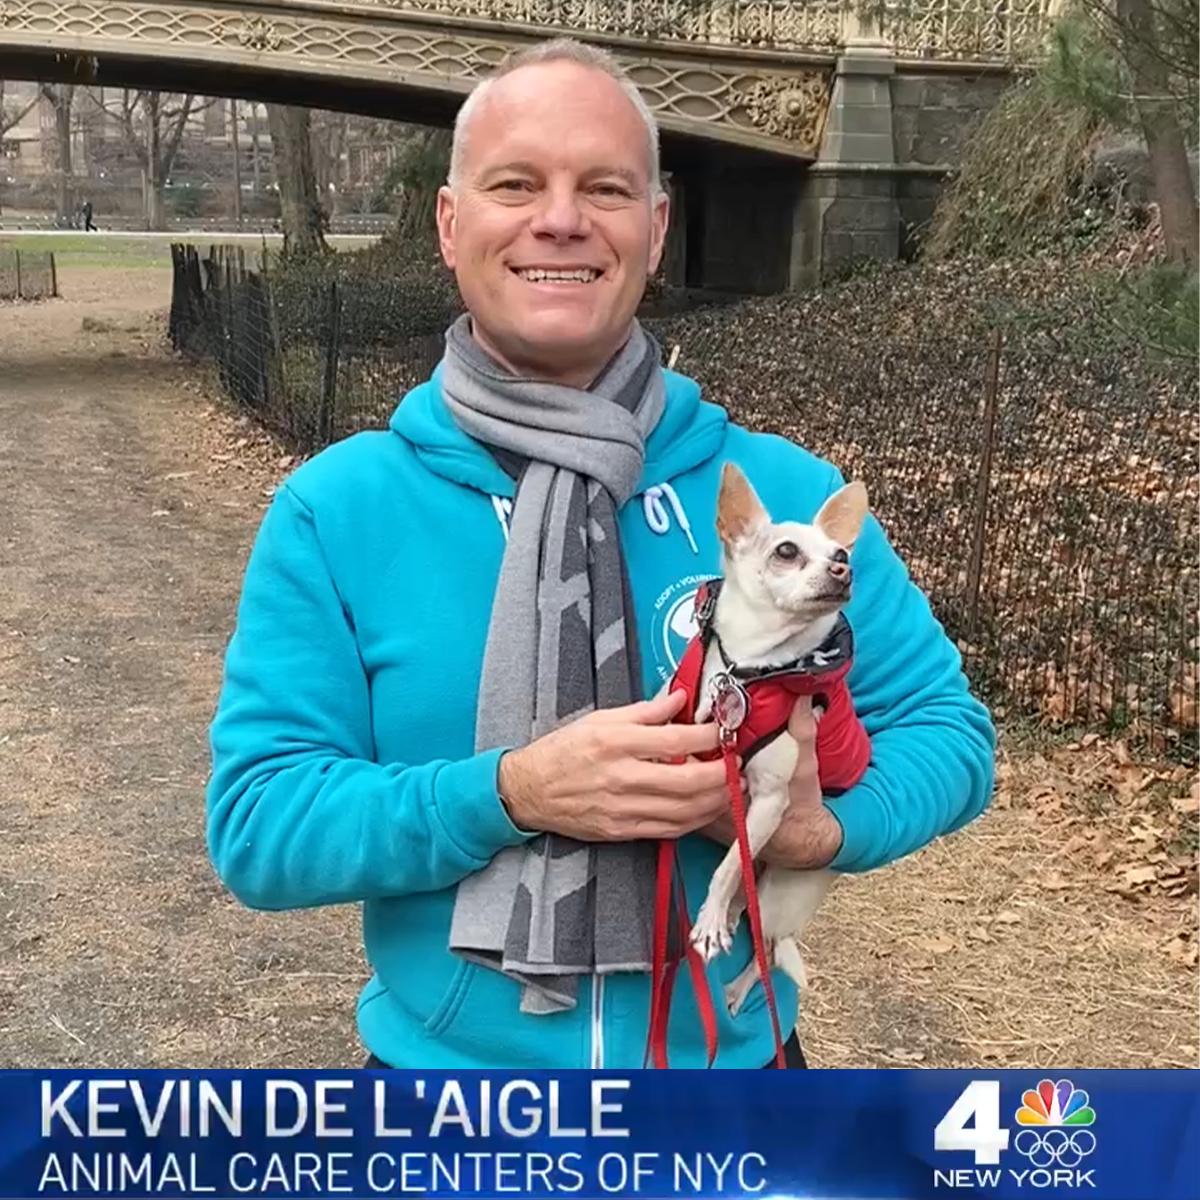 Kevin NBC